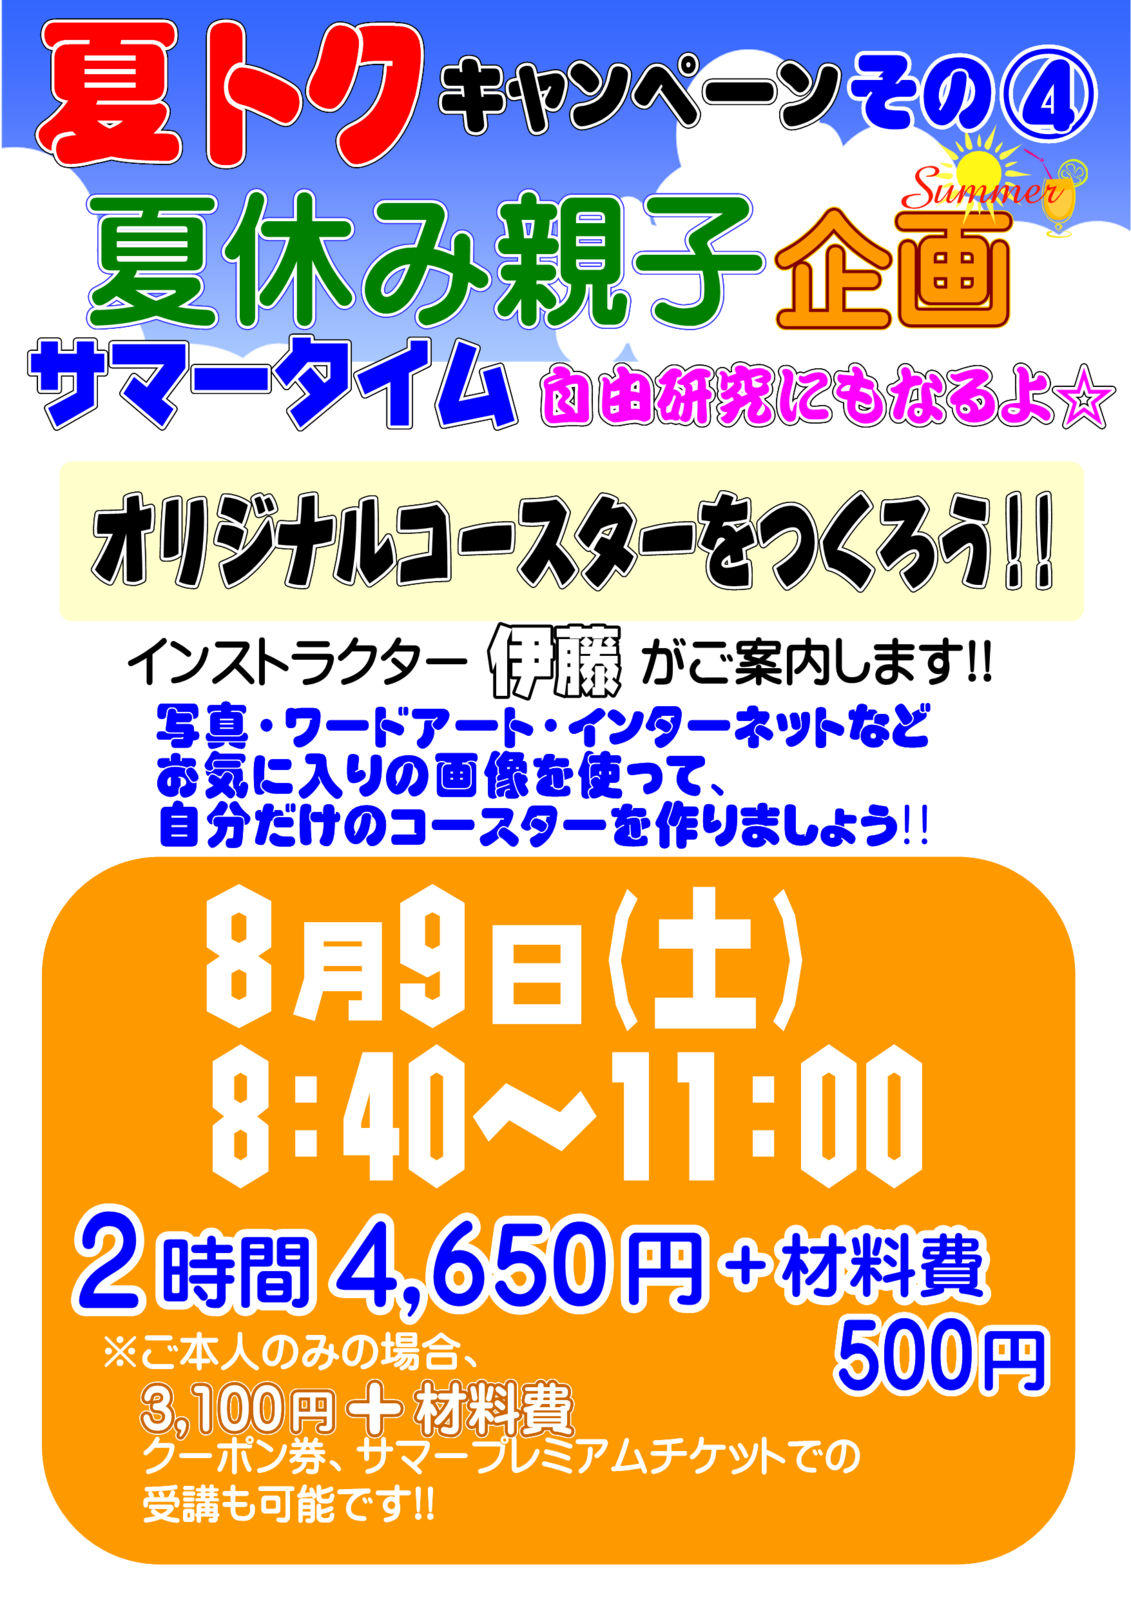 140809natutokukosuta_3